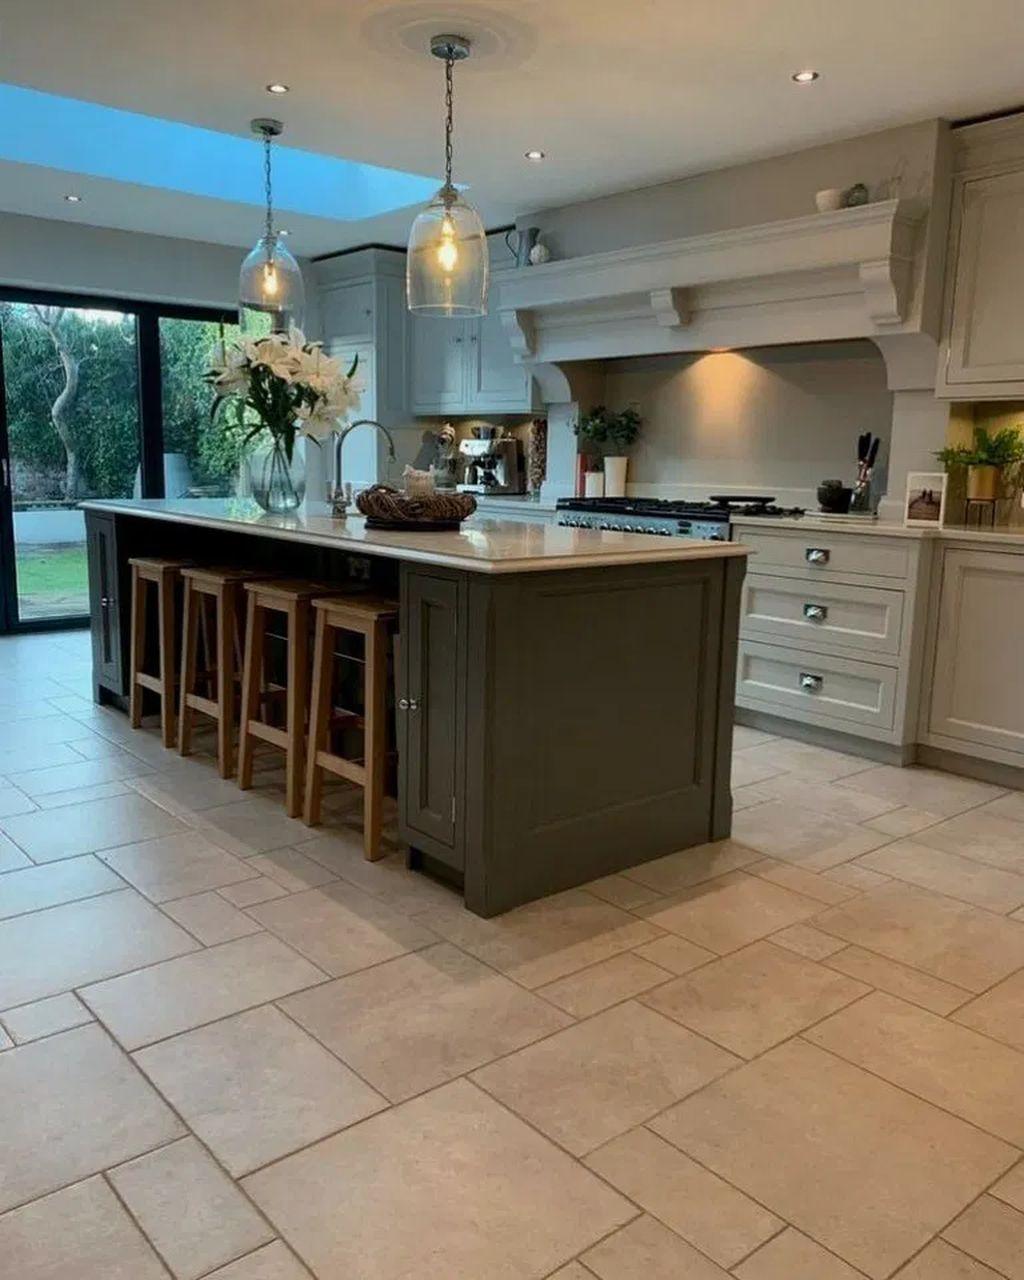 38 Elegant Kitchen Design Ideas For Small House To Copy Open Plan Kitchen Living Room Elegant Kitchen Design Kitchen Dining Living